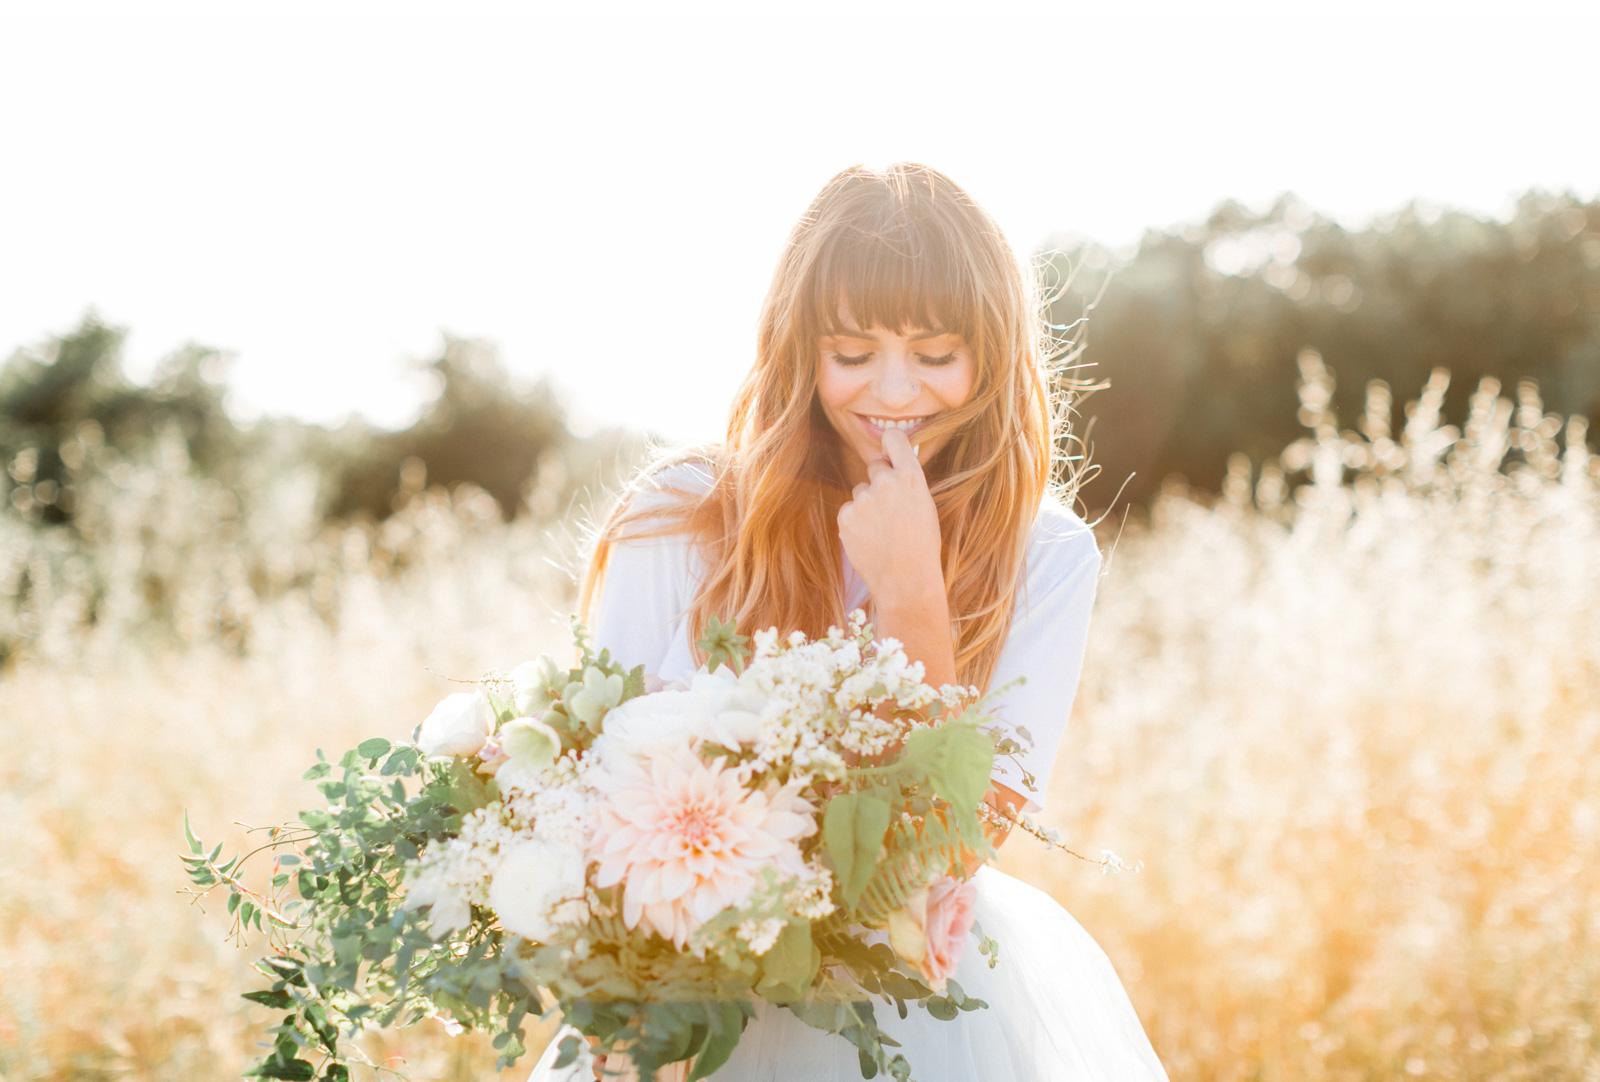 San-Luis-Obispo-Wedding-Photographer-Natalie-Schutt-Photography_09.jpg